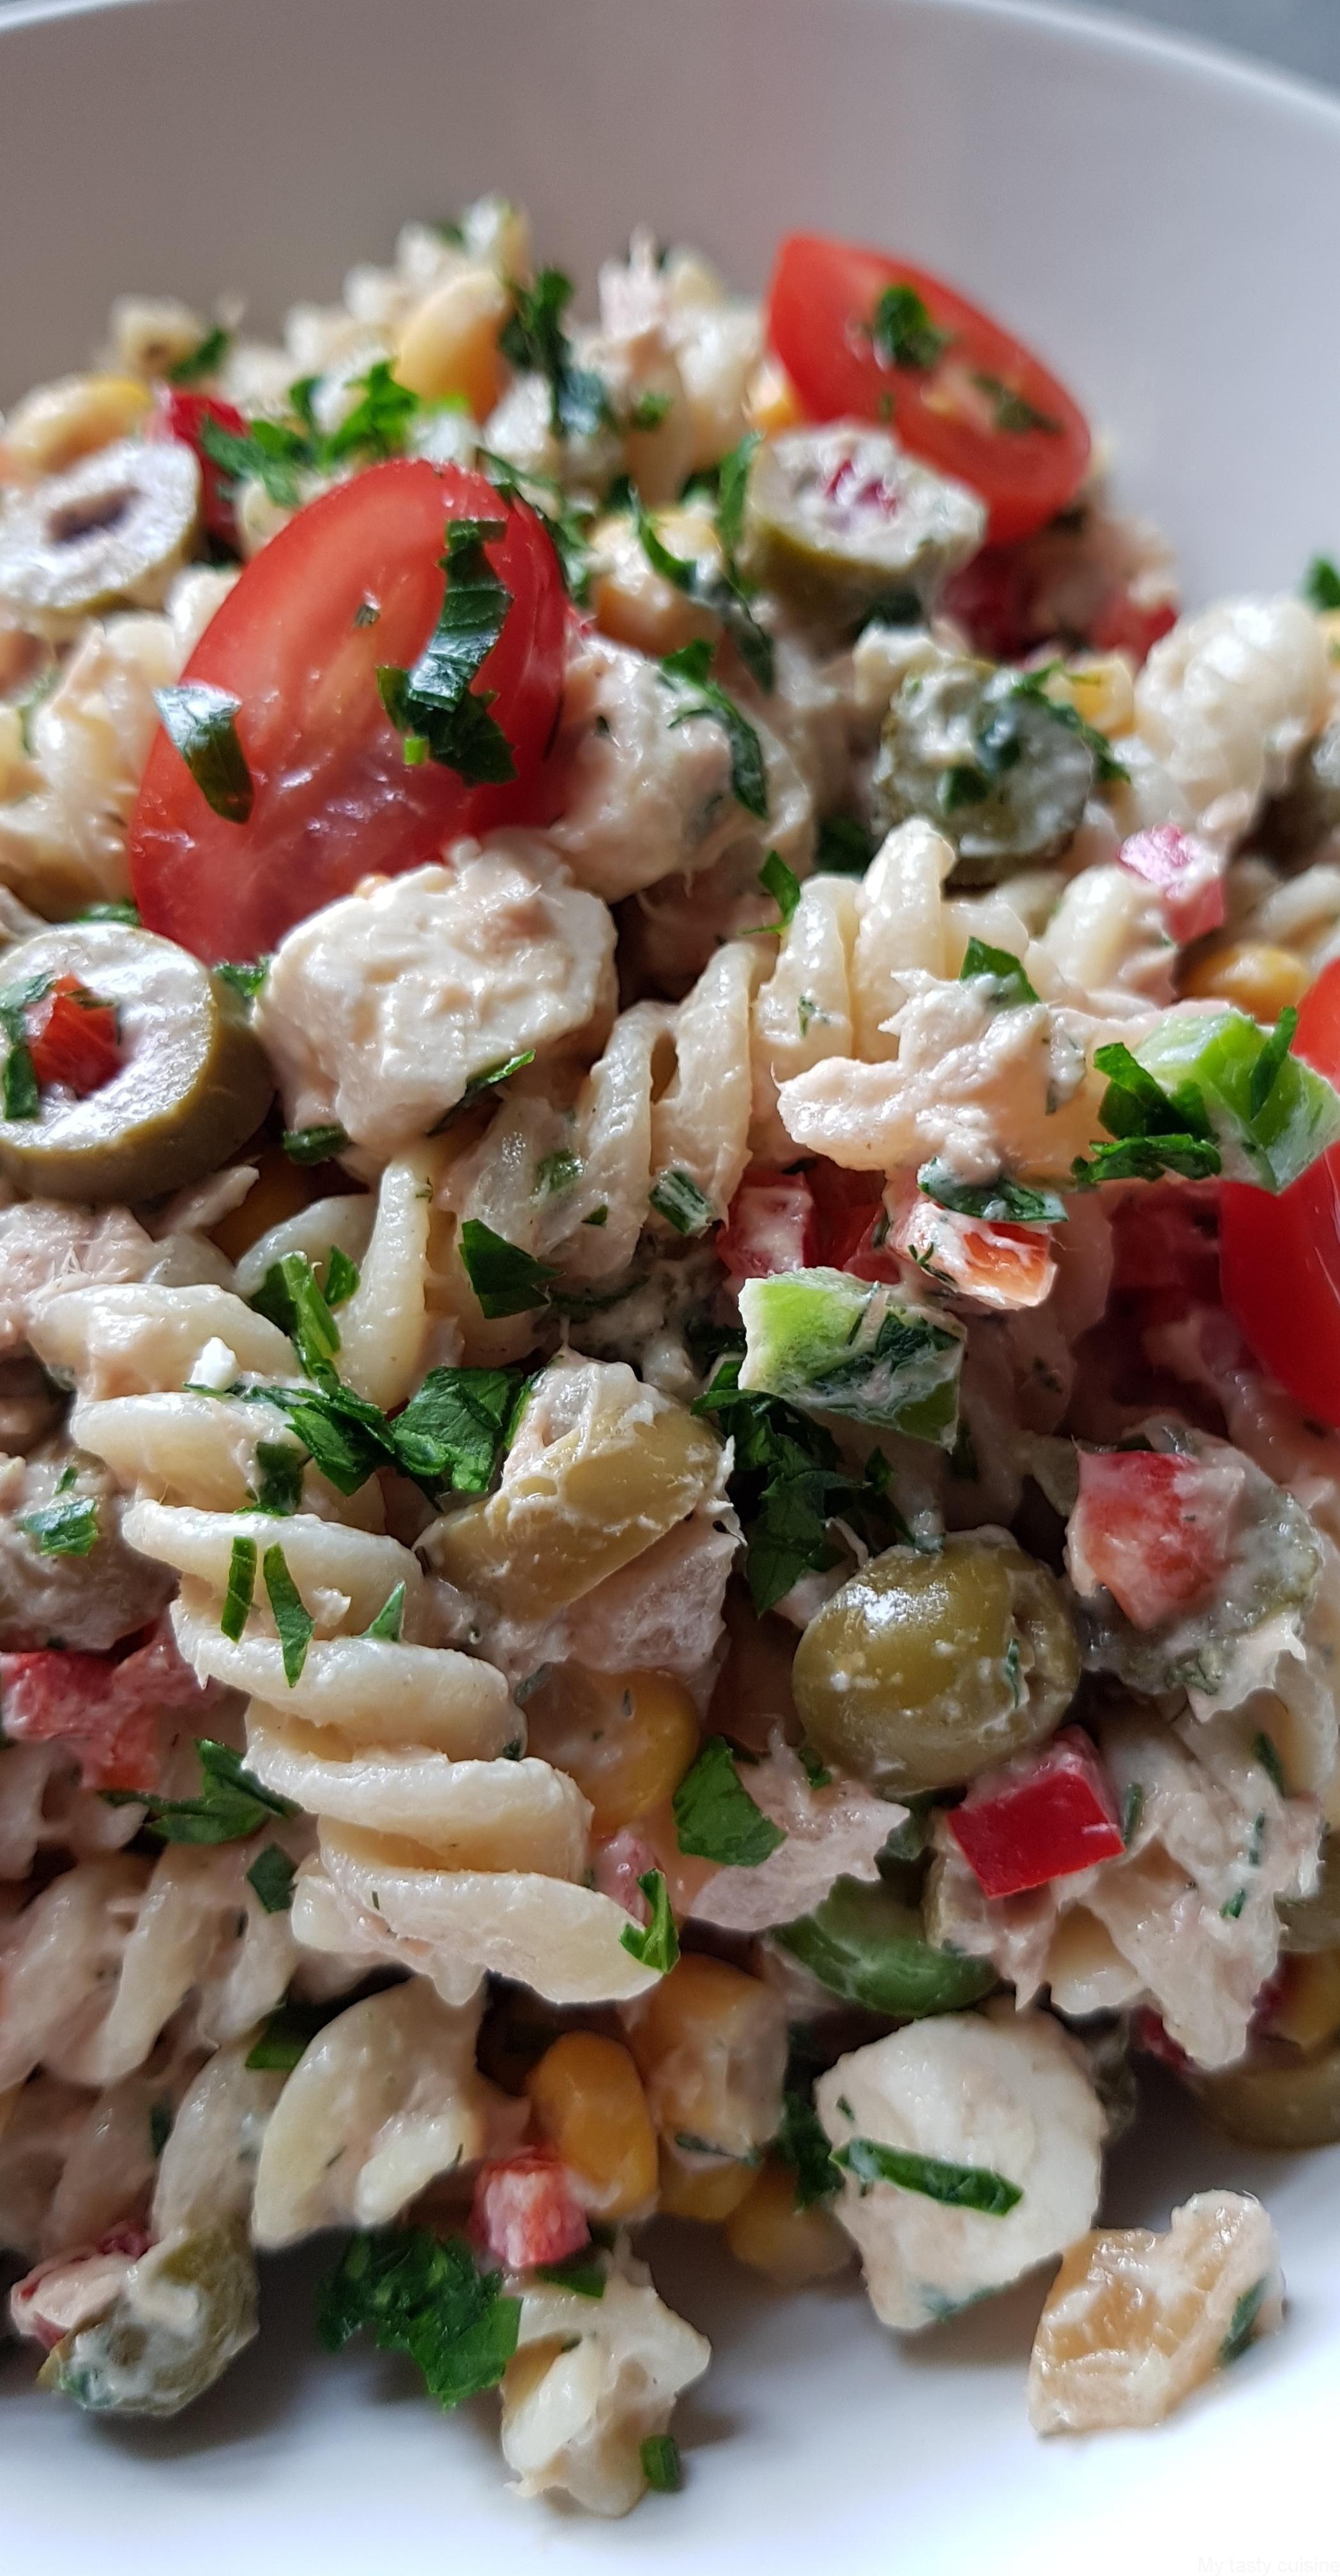 Salades Composee Pour Barbecue : salades, composee, barbecue, Épinglé, Cuisine